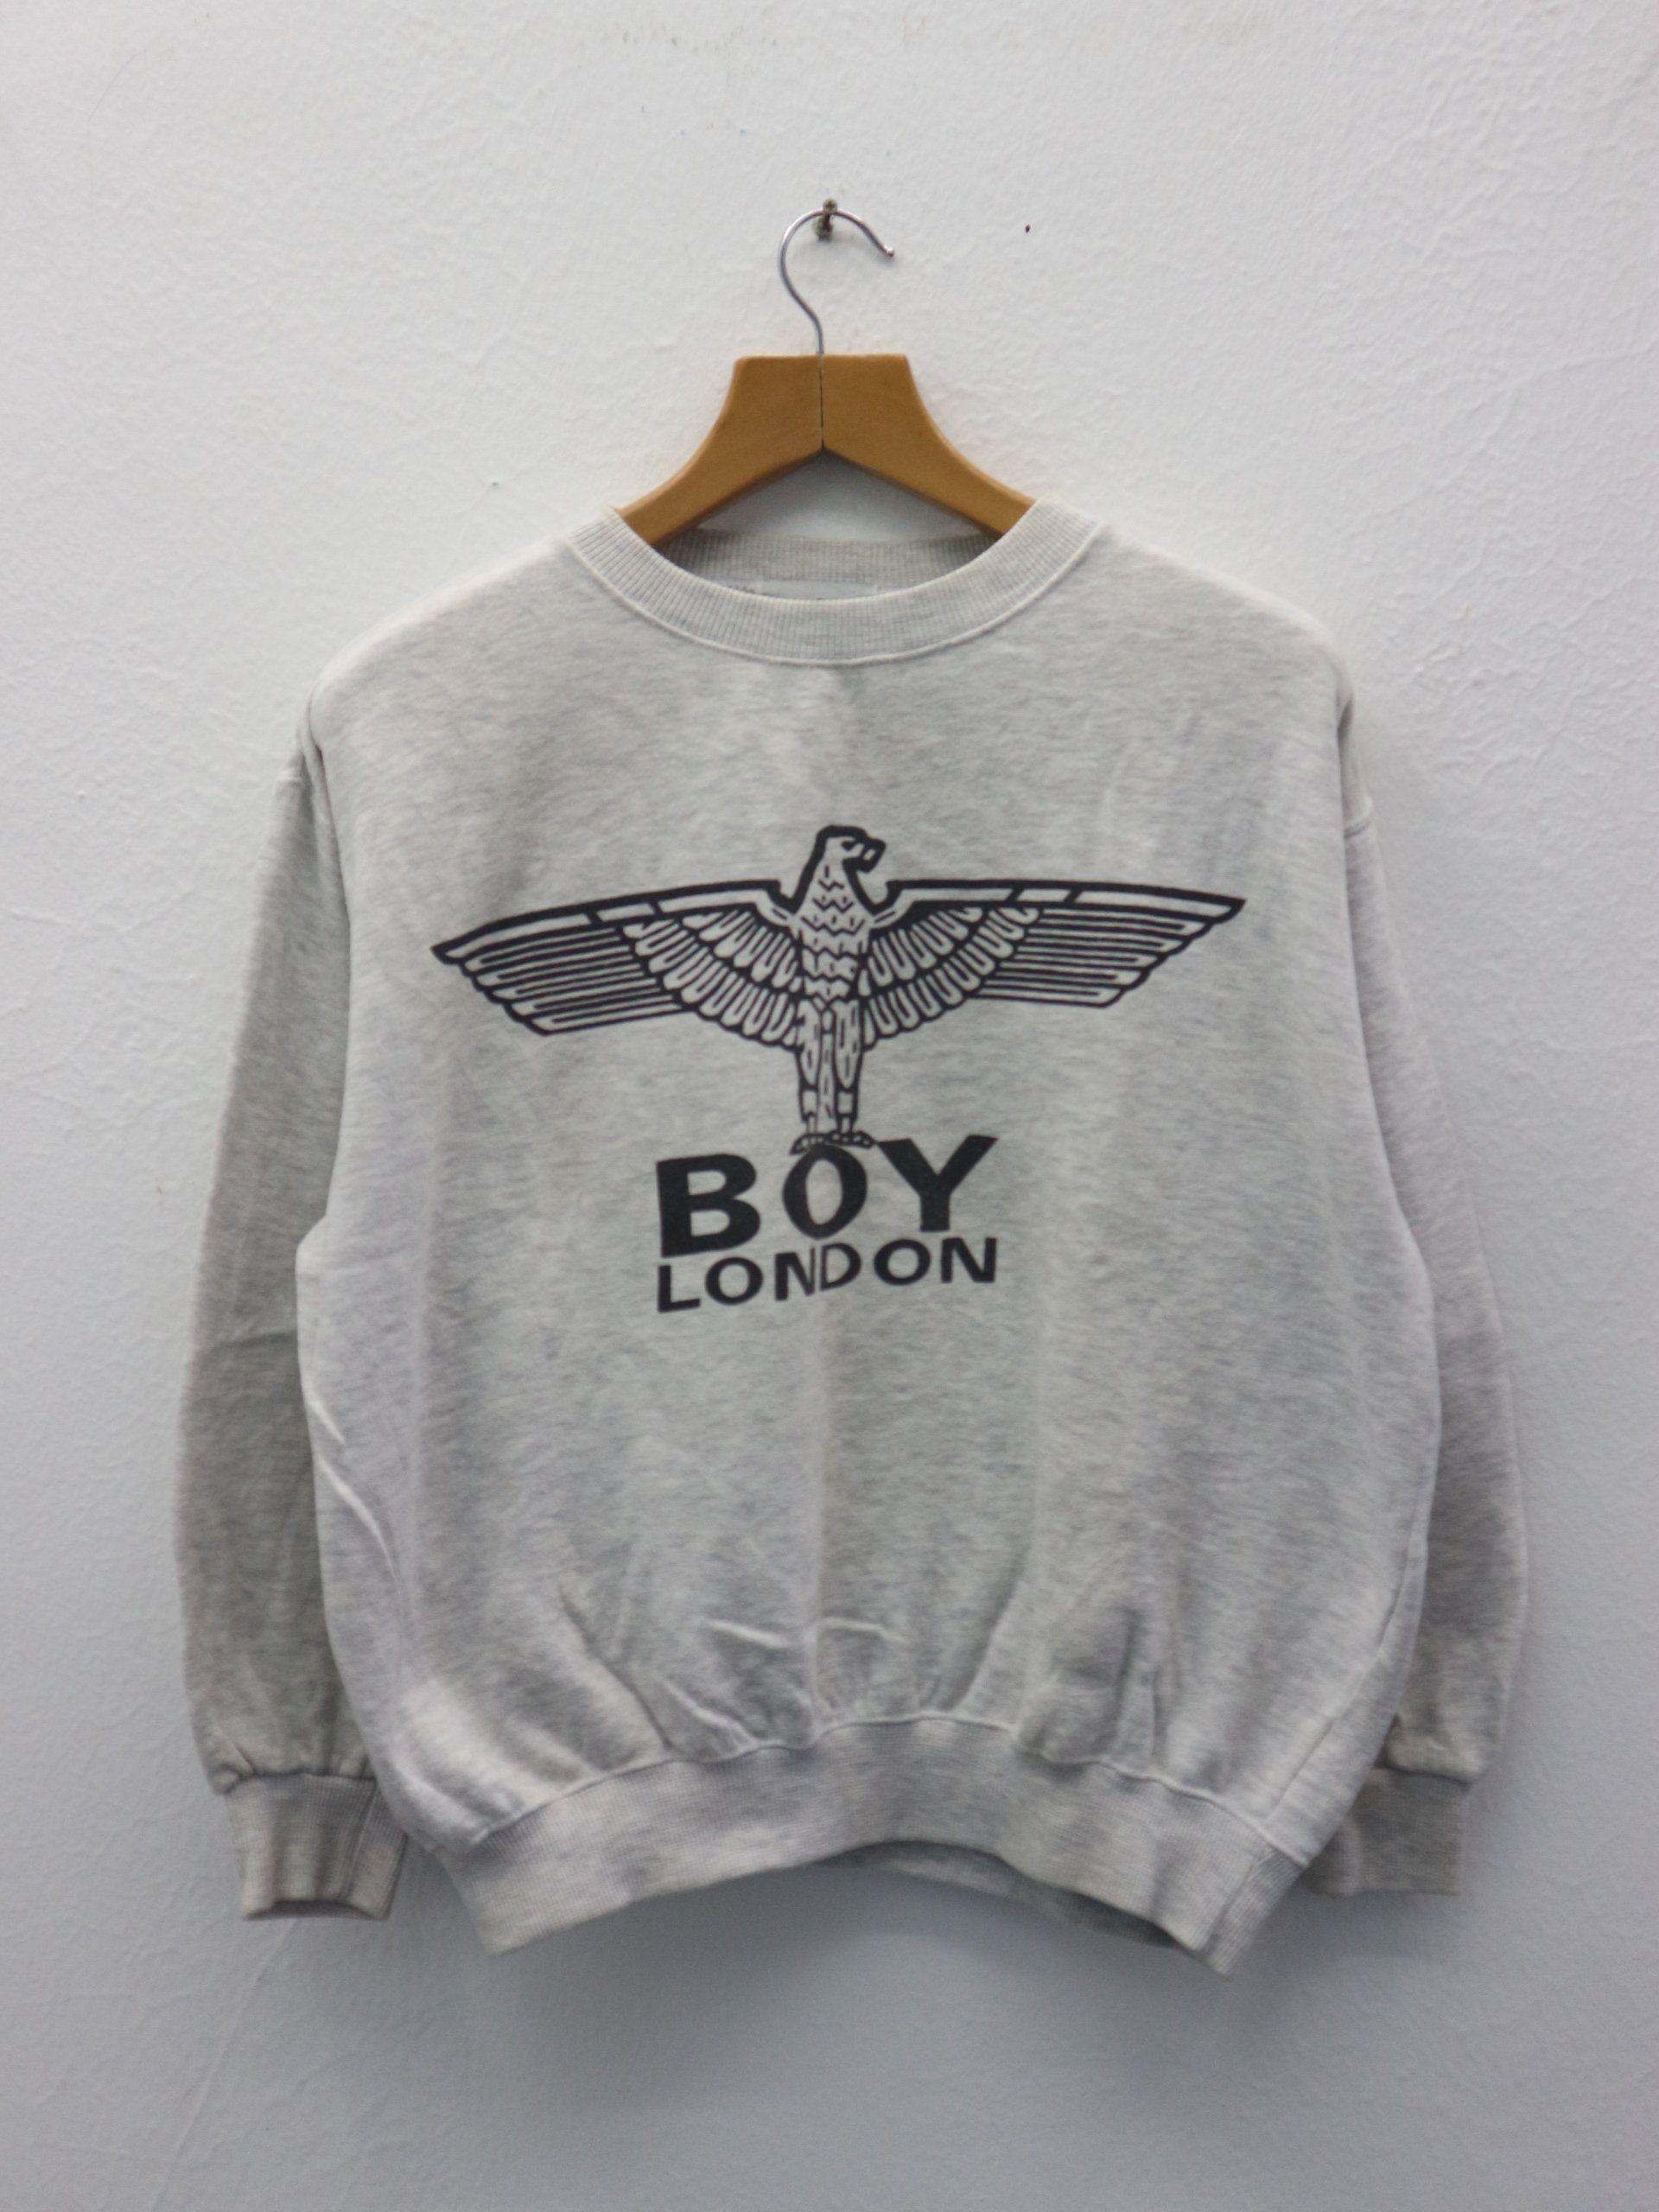 Vintage Boy London Sweatshirt Big Logo Designer Fashion Etsy Sweatshirts Sweatshirt Fashion Boy London [ 2560 x 1920 Pixel ]